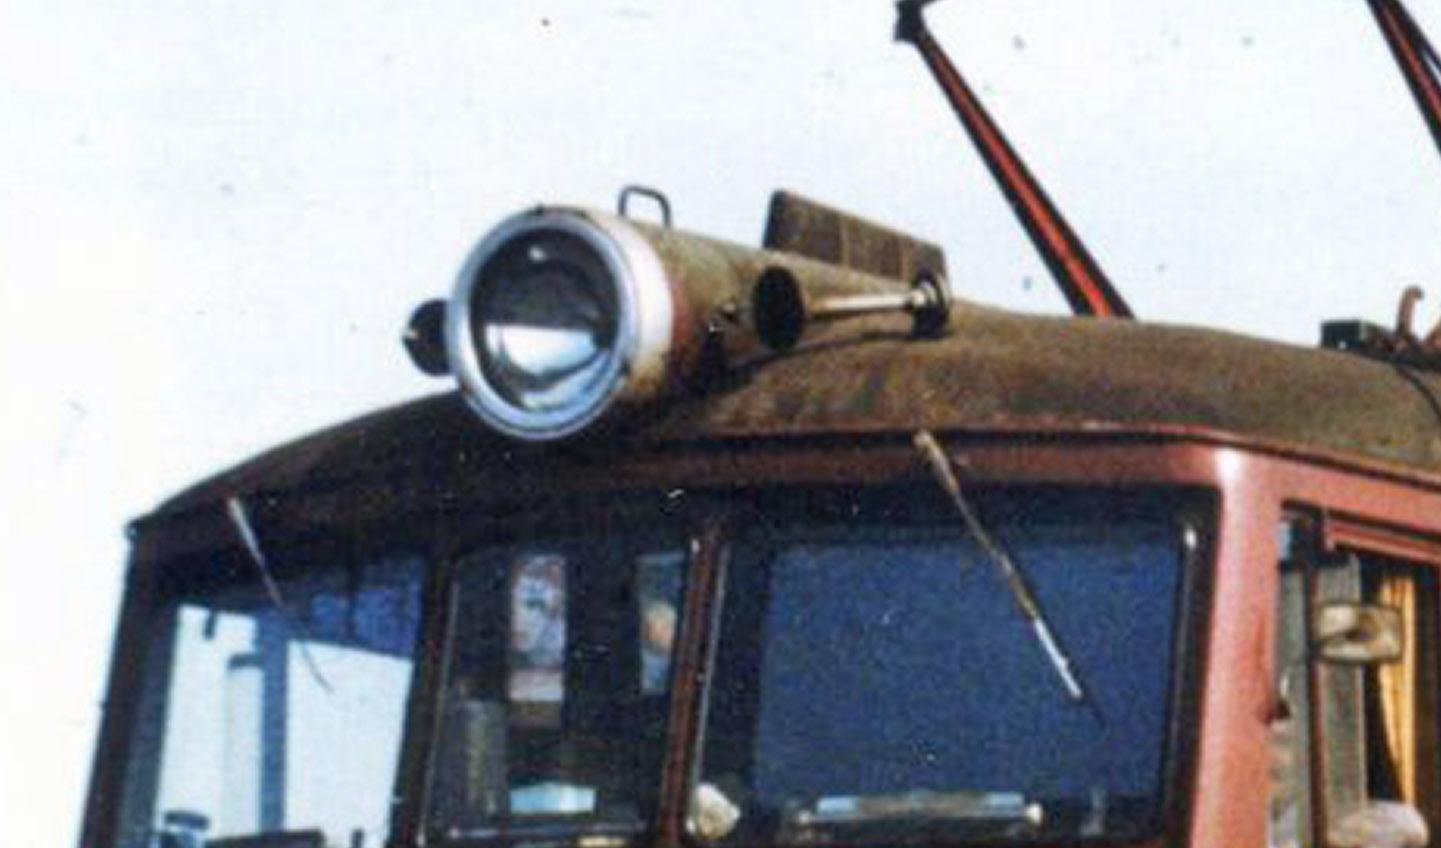 ET41-100 2 X 1983.jpg